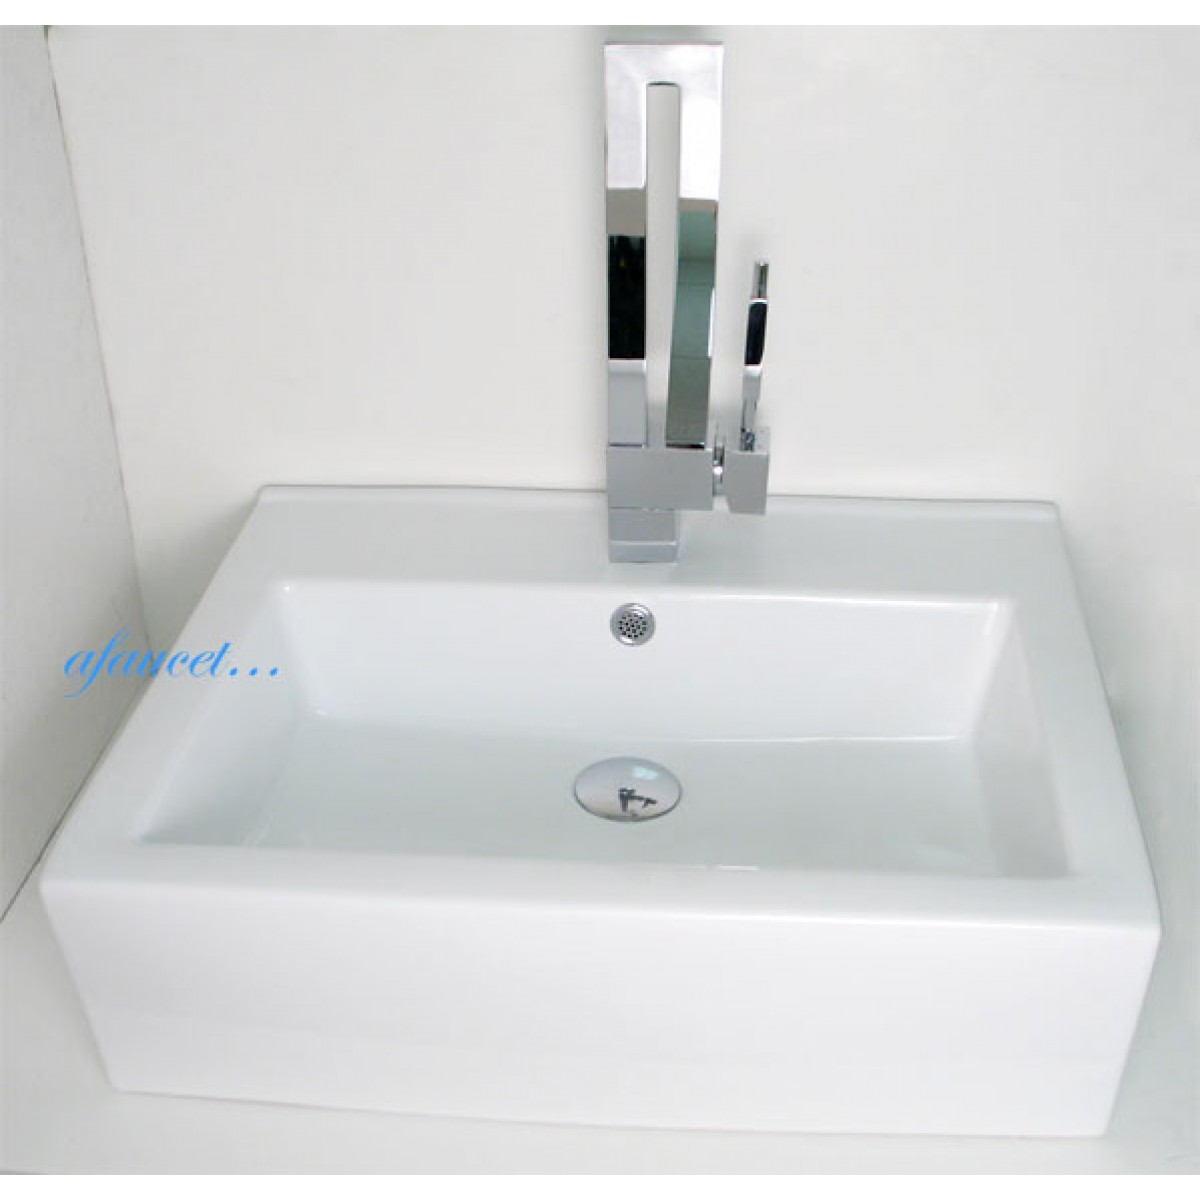 Rectangular Porcelain Ceramic Single Hole Countertop Bathroom Vessel ...